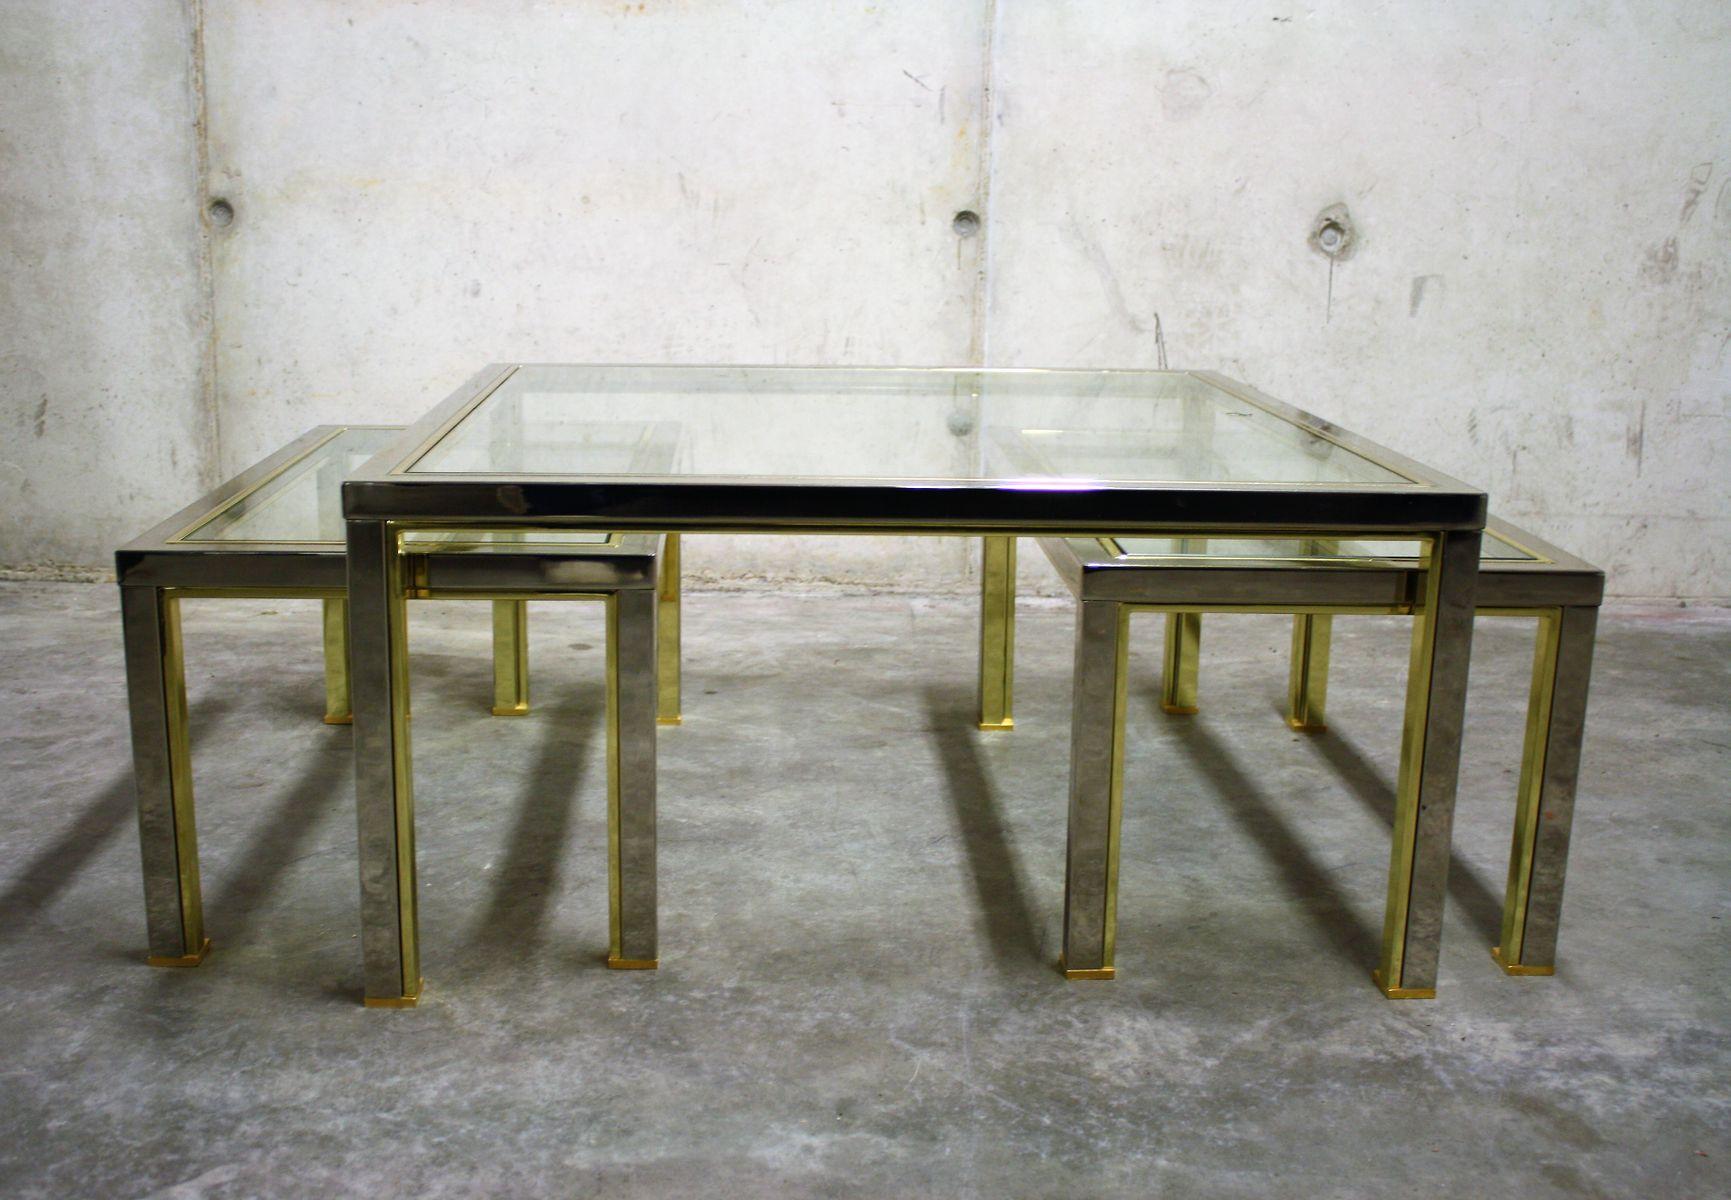 Vintage Hollywood Regency Brass \u0026 Chrome Coffee Tables Set of 3 & Vintage Hollywood Regency Brass \u0026 Chrome Coffee Tables Set of 3 for ...